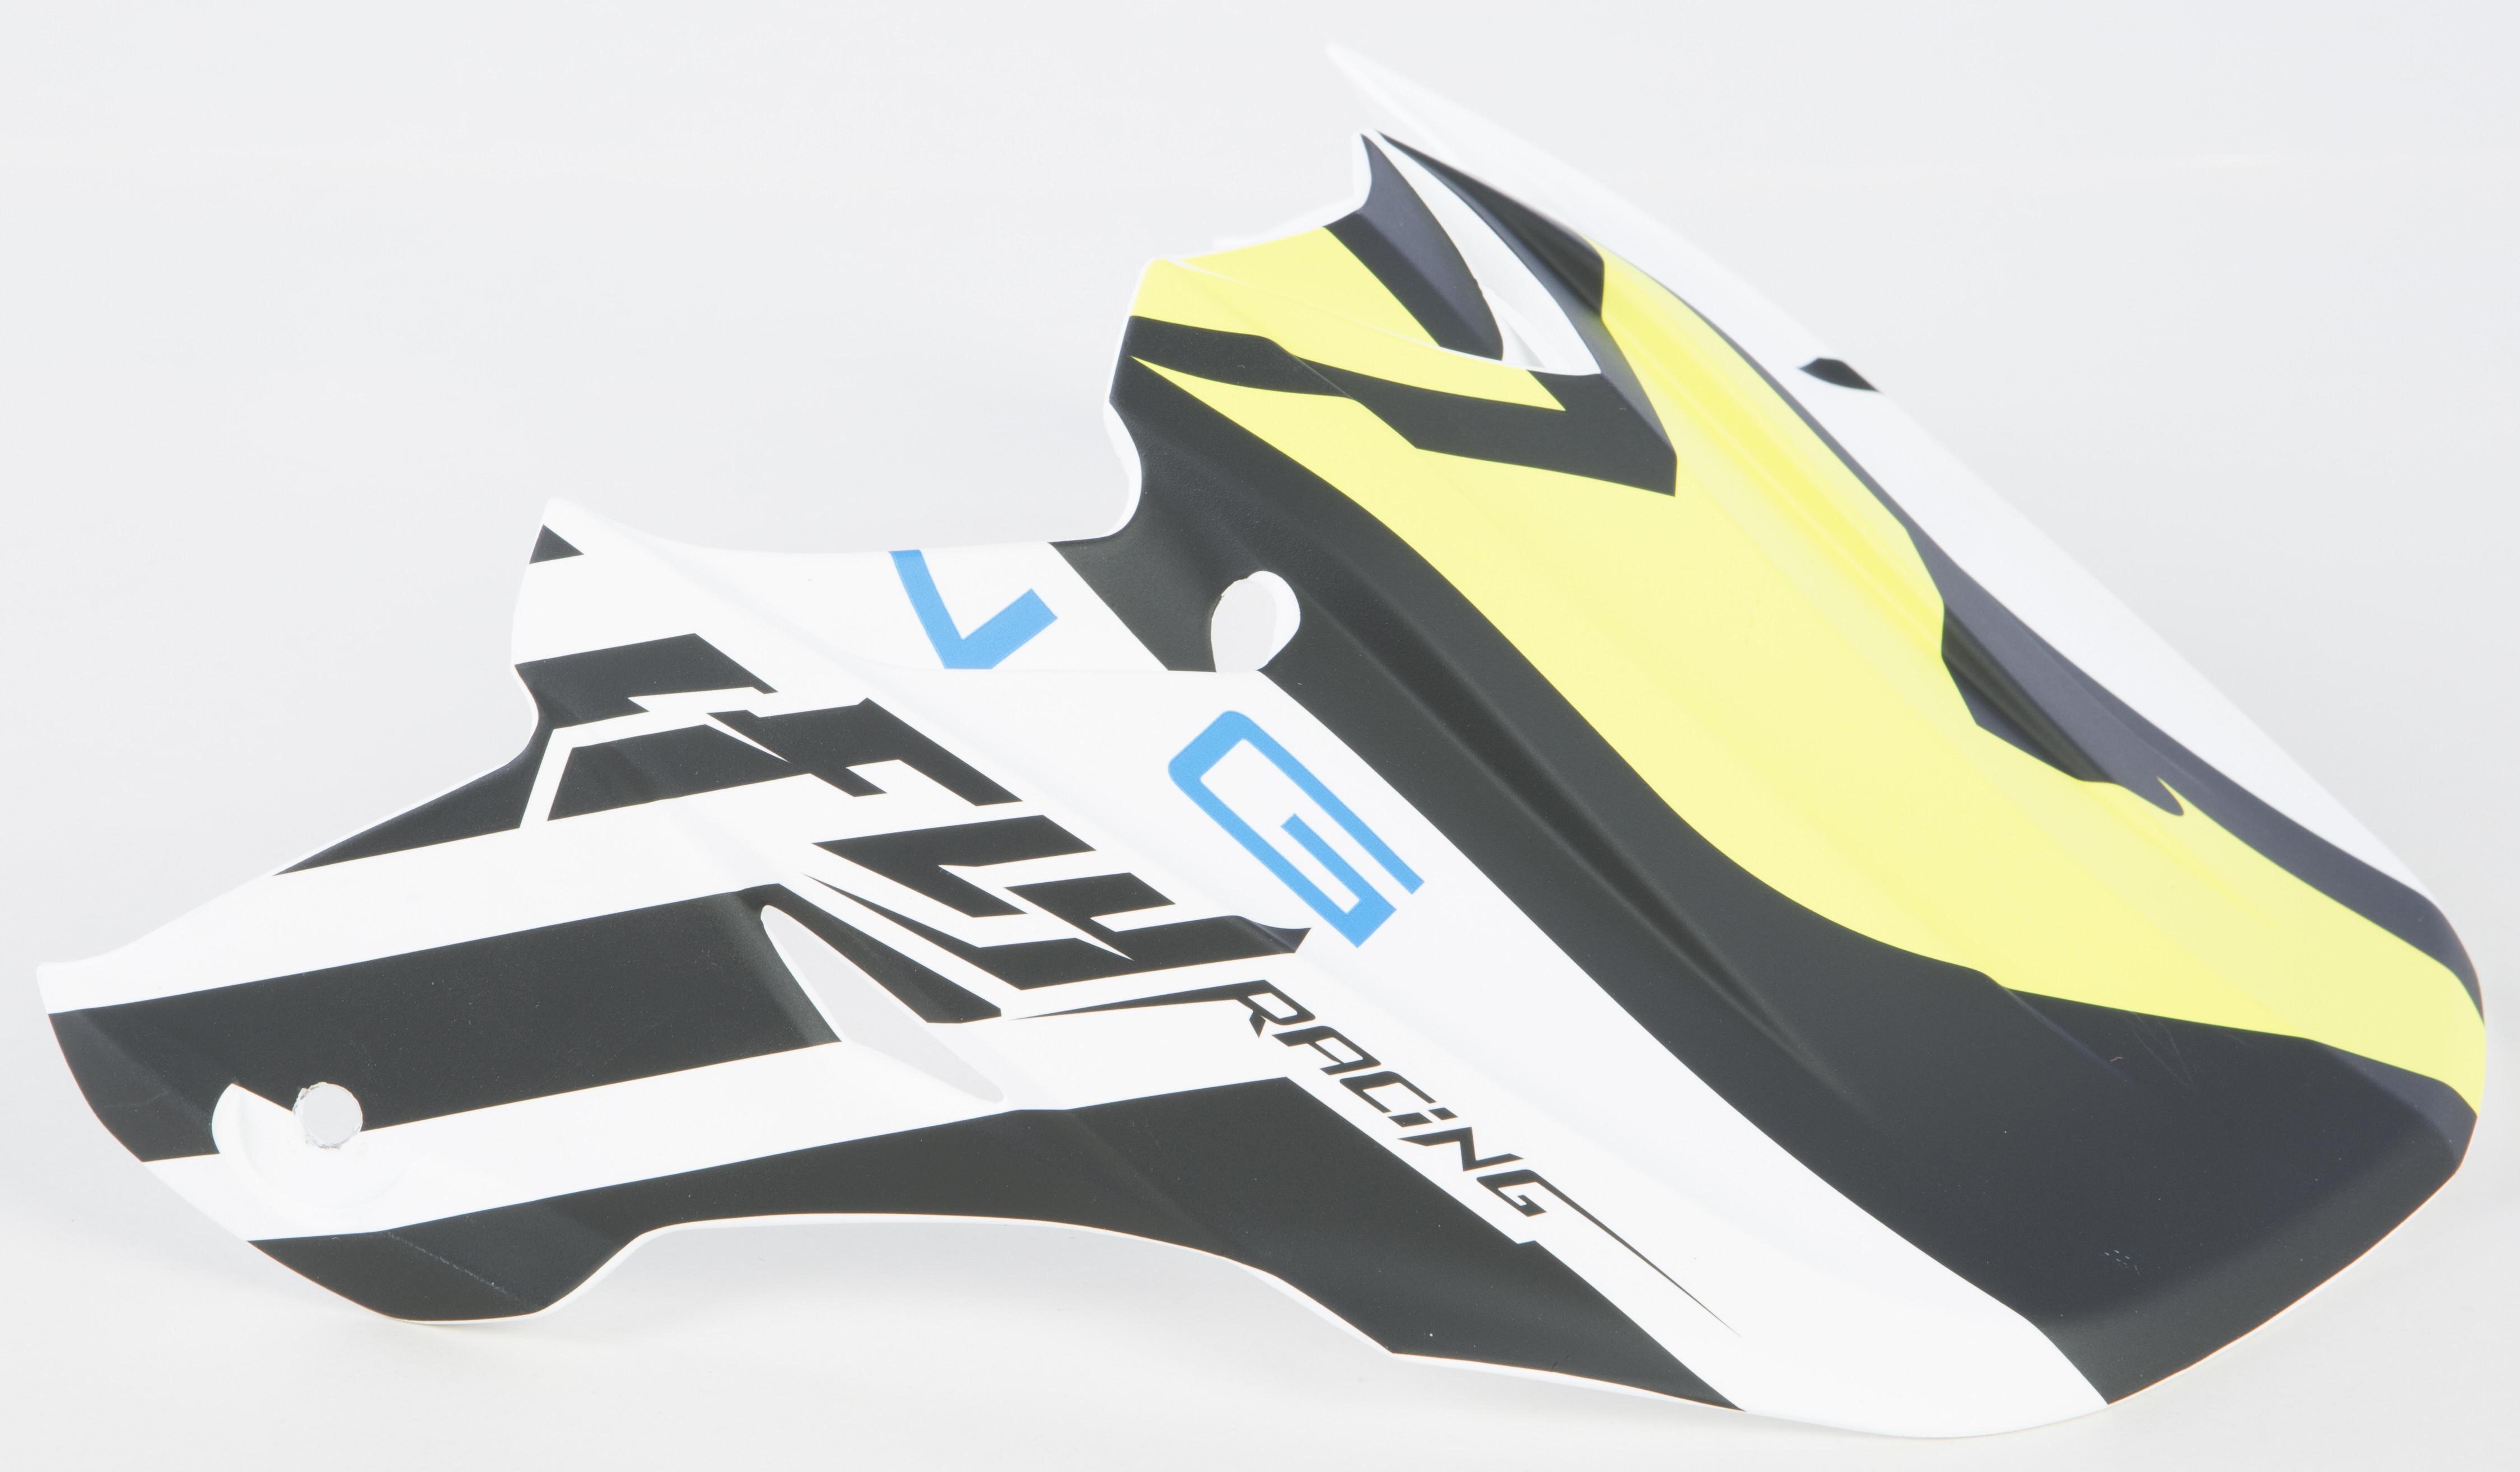 F2 Carbon Mips Helmet Visor (Matte White/Black/Hi-Vis)